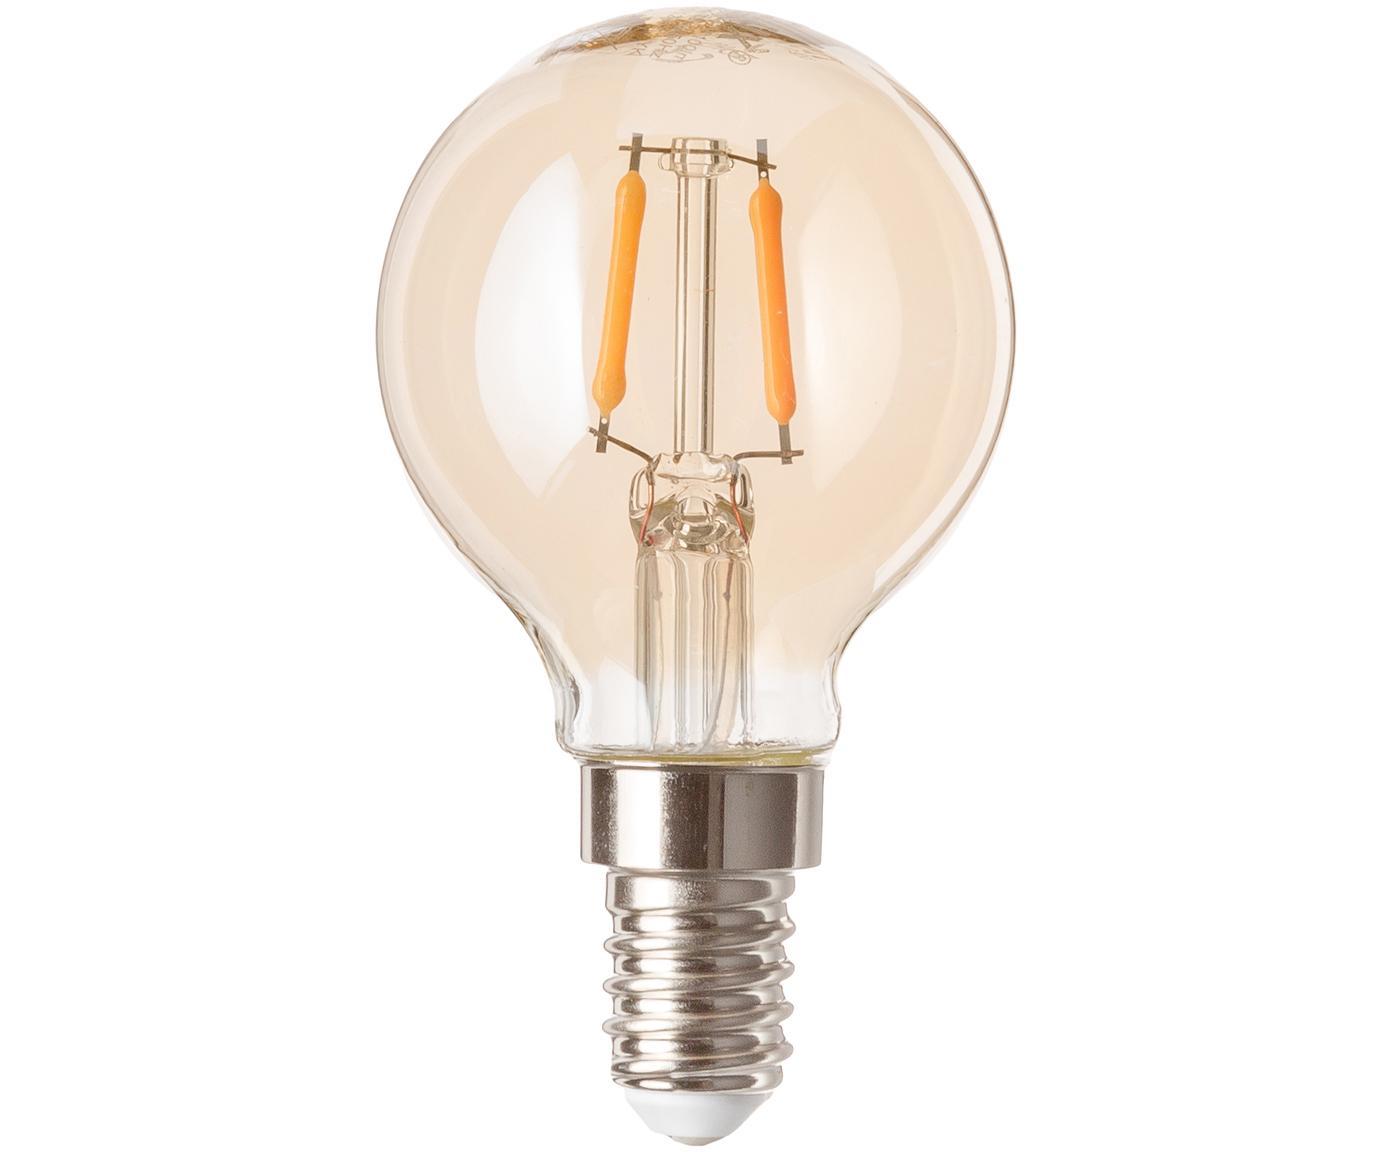 Lampadina a LED Luel (E14 / 1,2Watt) 5 pz, Lampadina: vetro, Ambra, Ø 5 x Alt. 8 cm